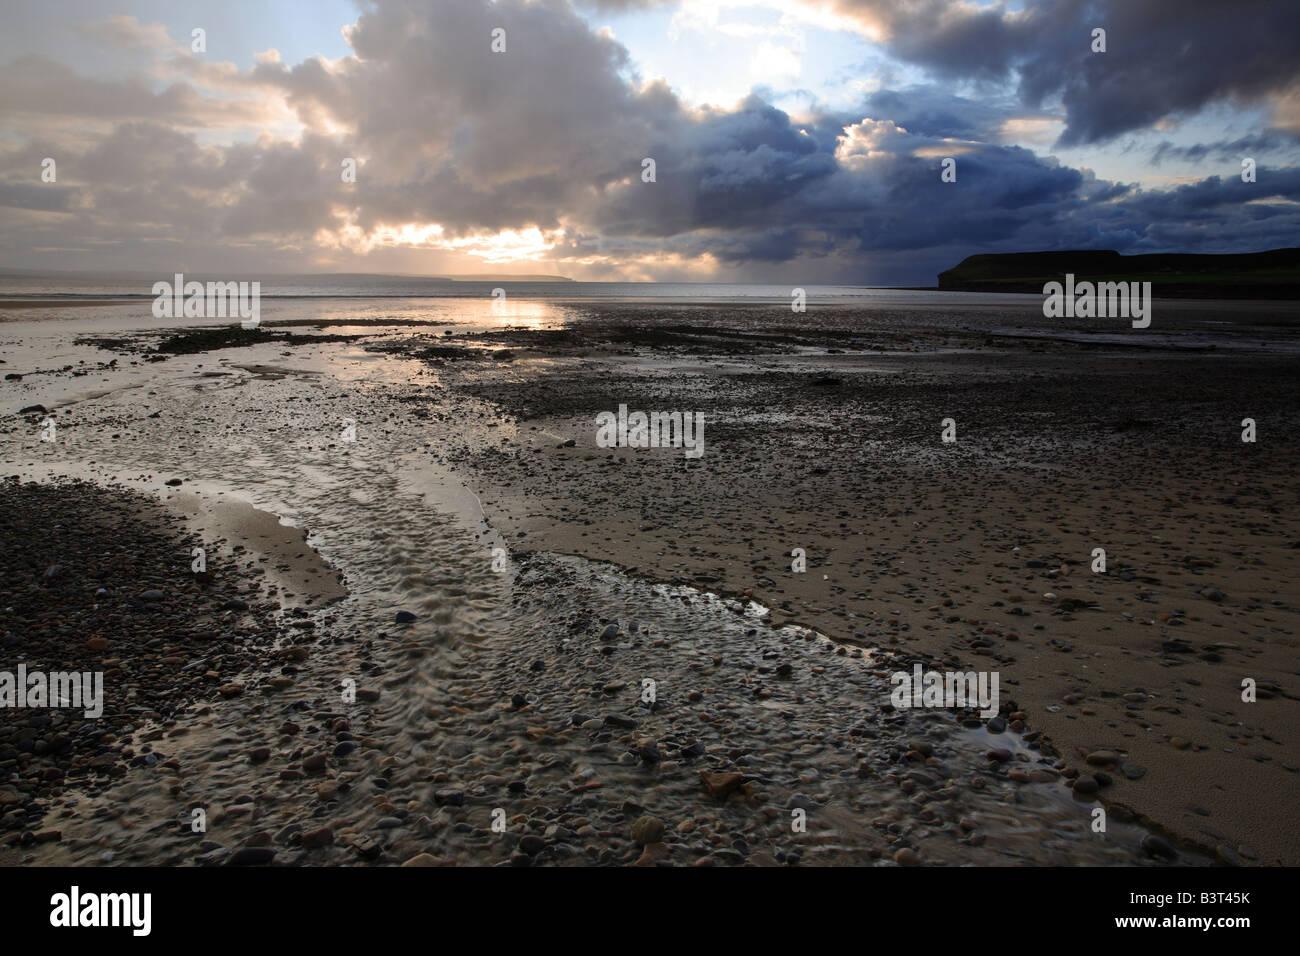 Dunnet Bay at sunset from Dunnet near Thurso Caithness Scotland - Stock Image